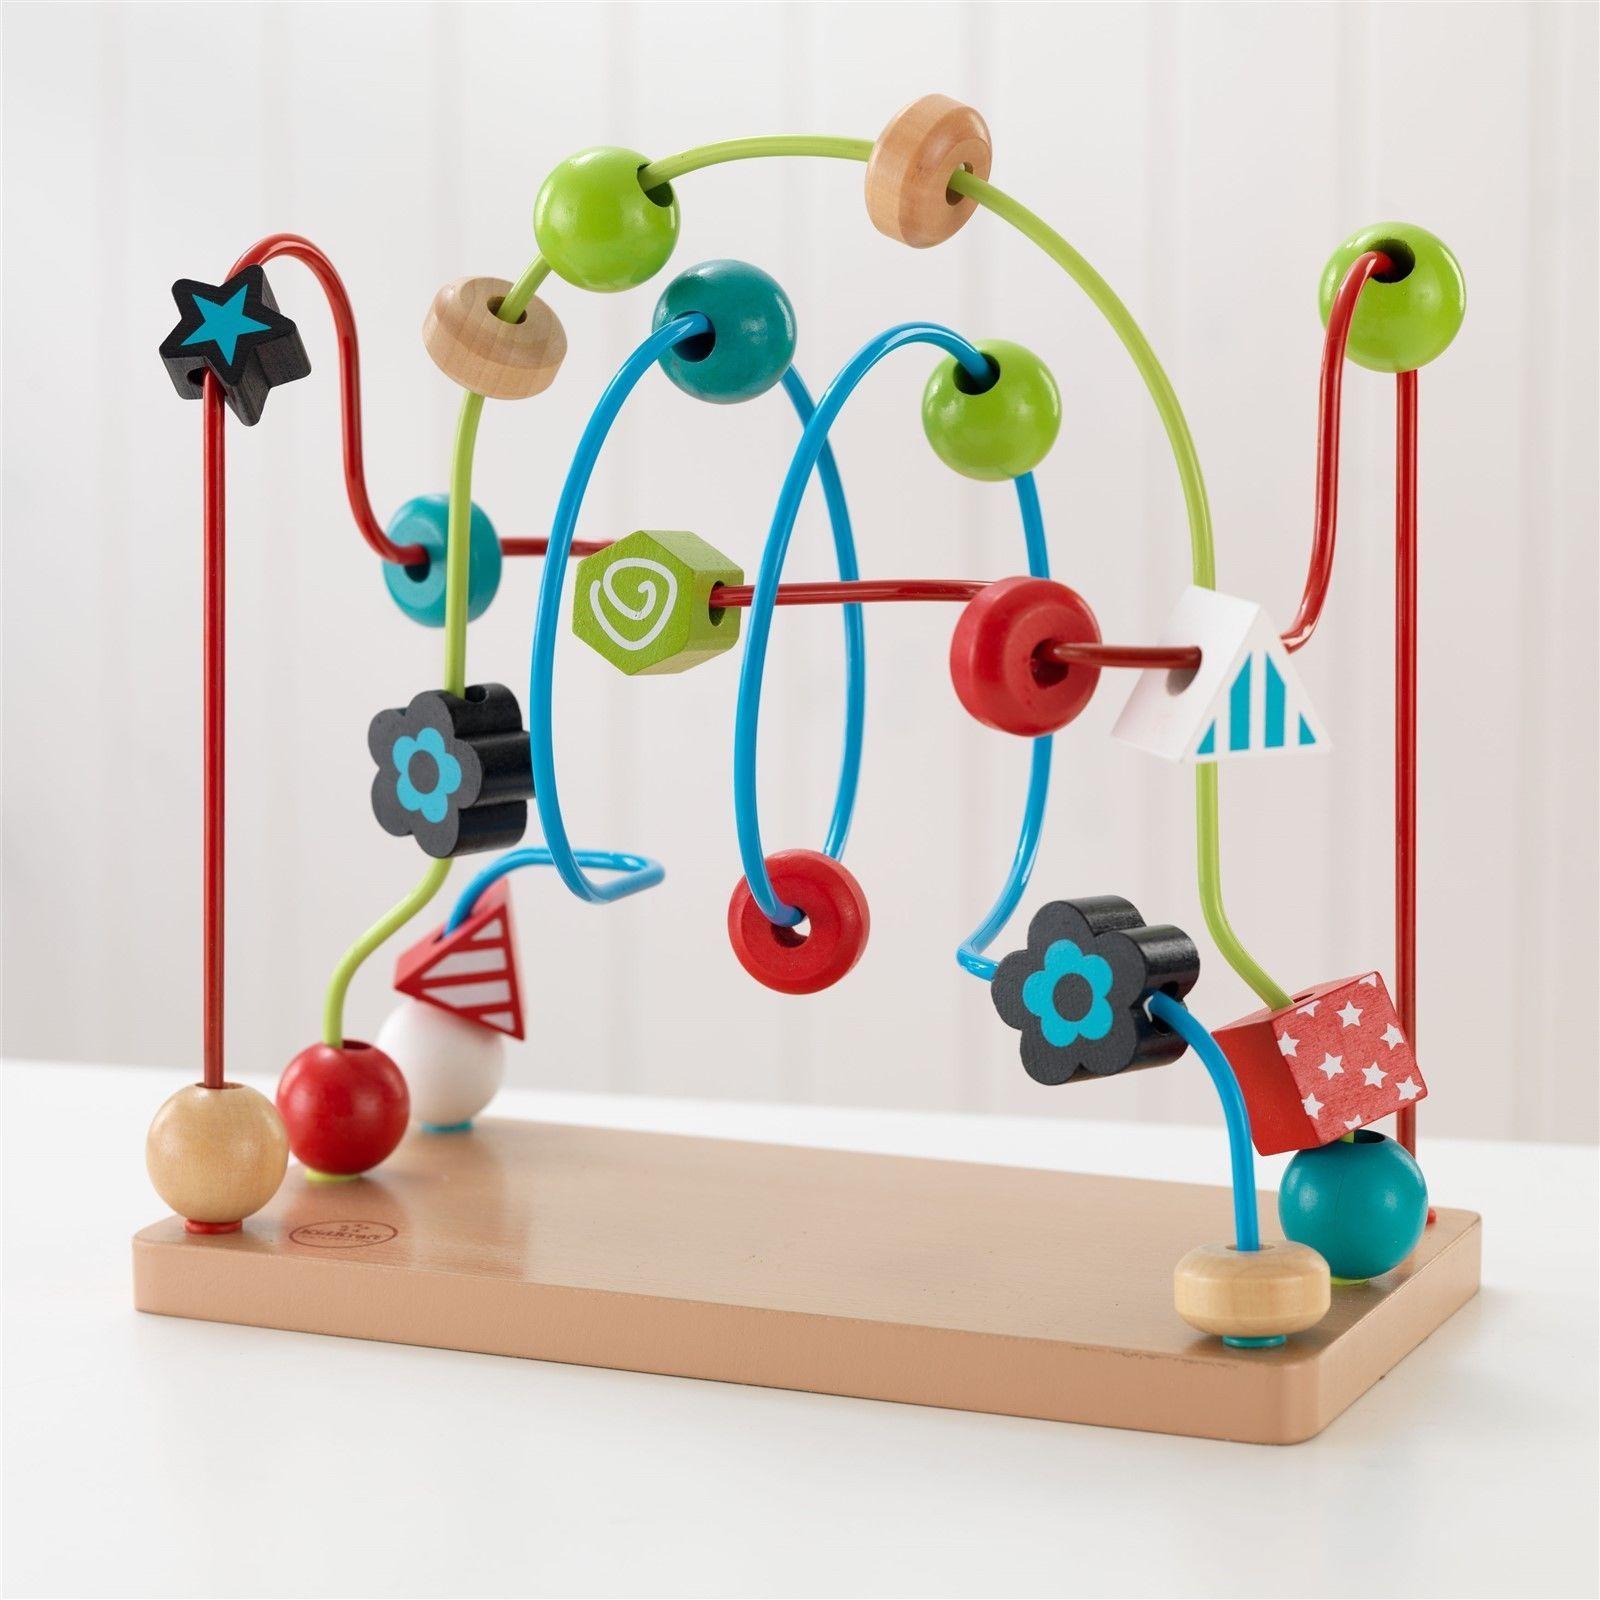 KidKraft 63241 Kids Children\'s Bead Maze and similar items